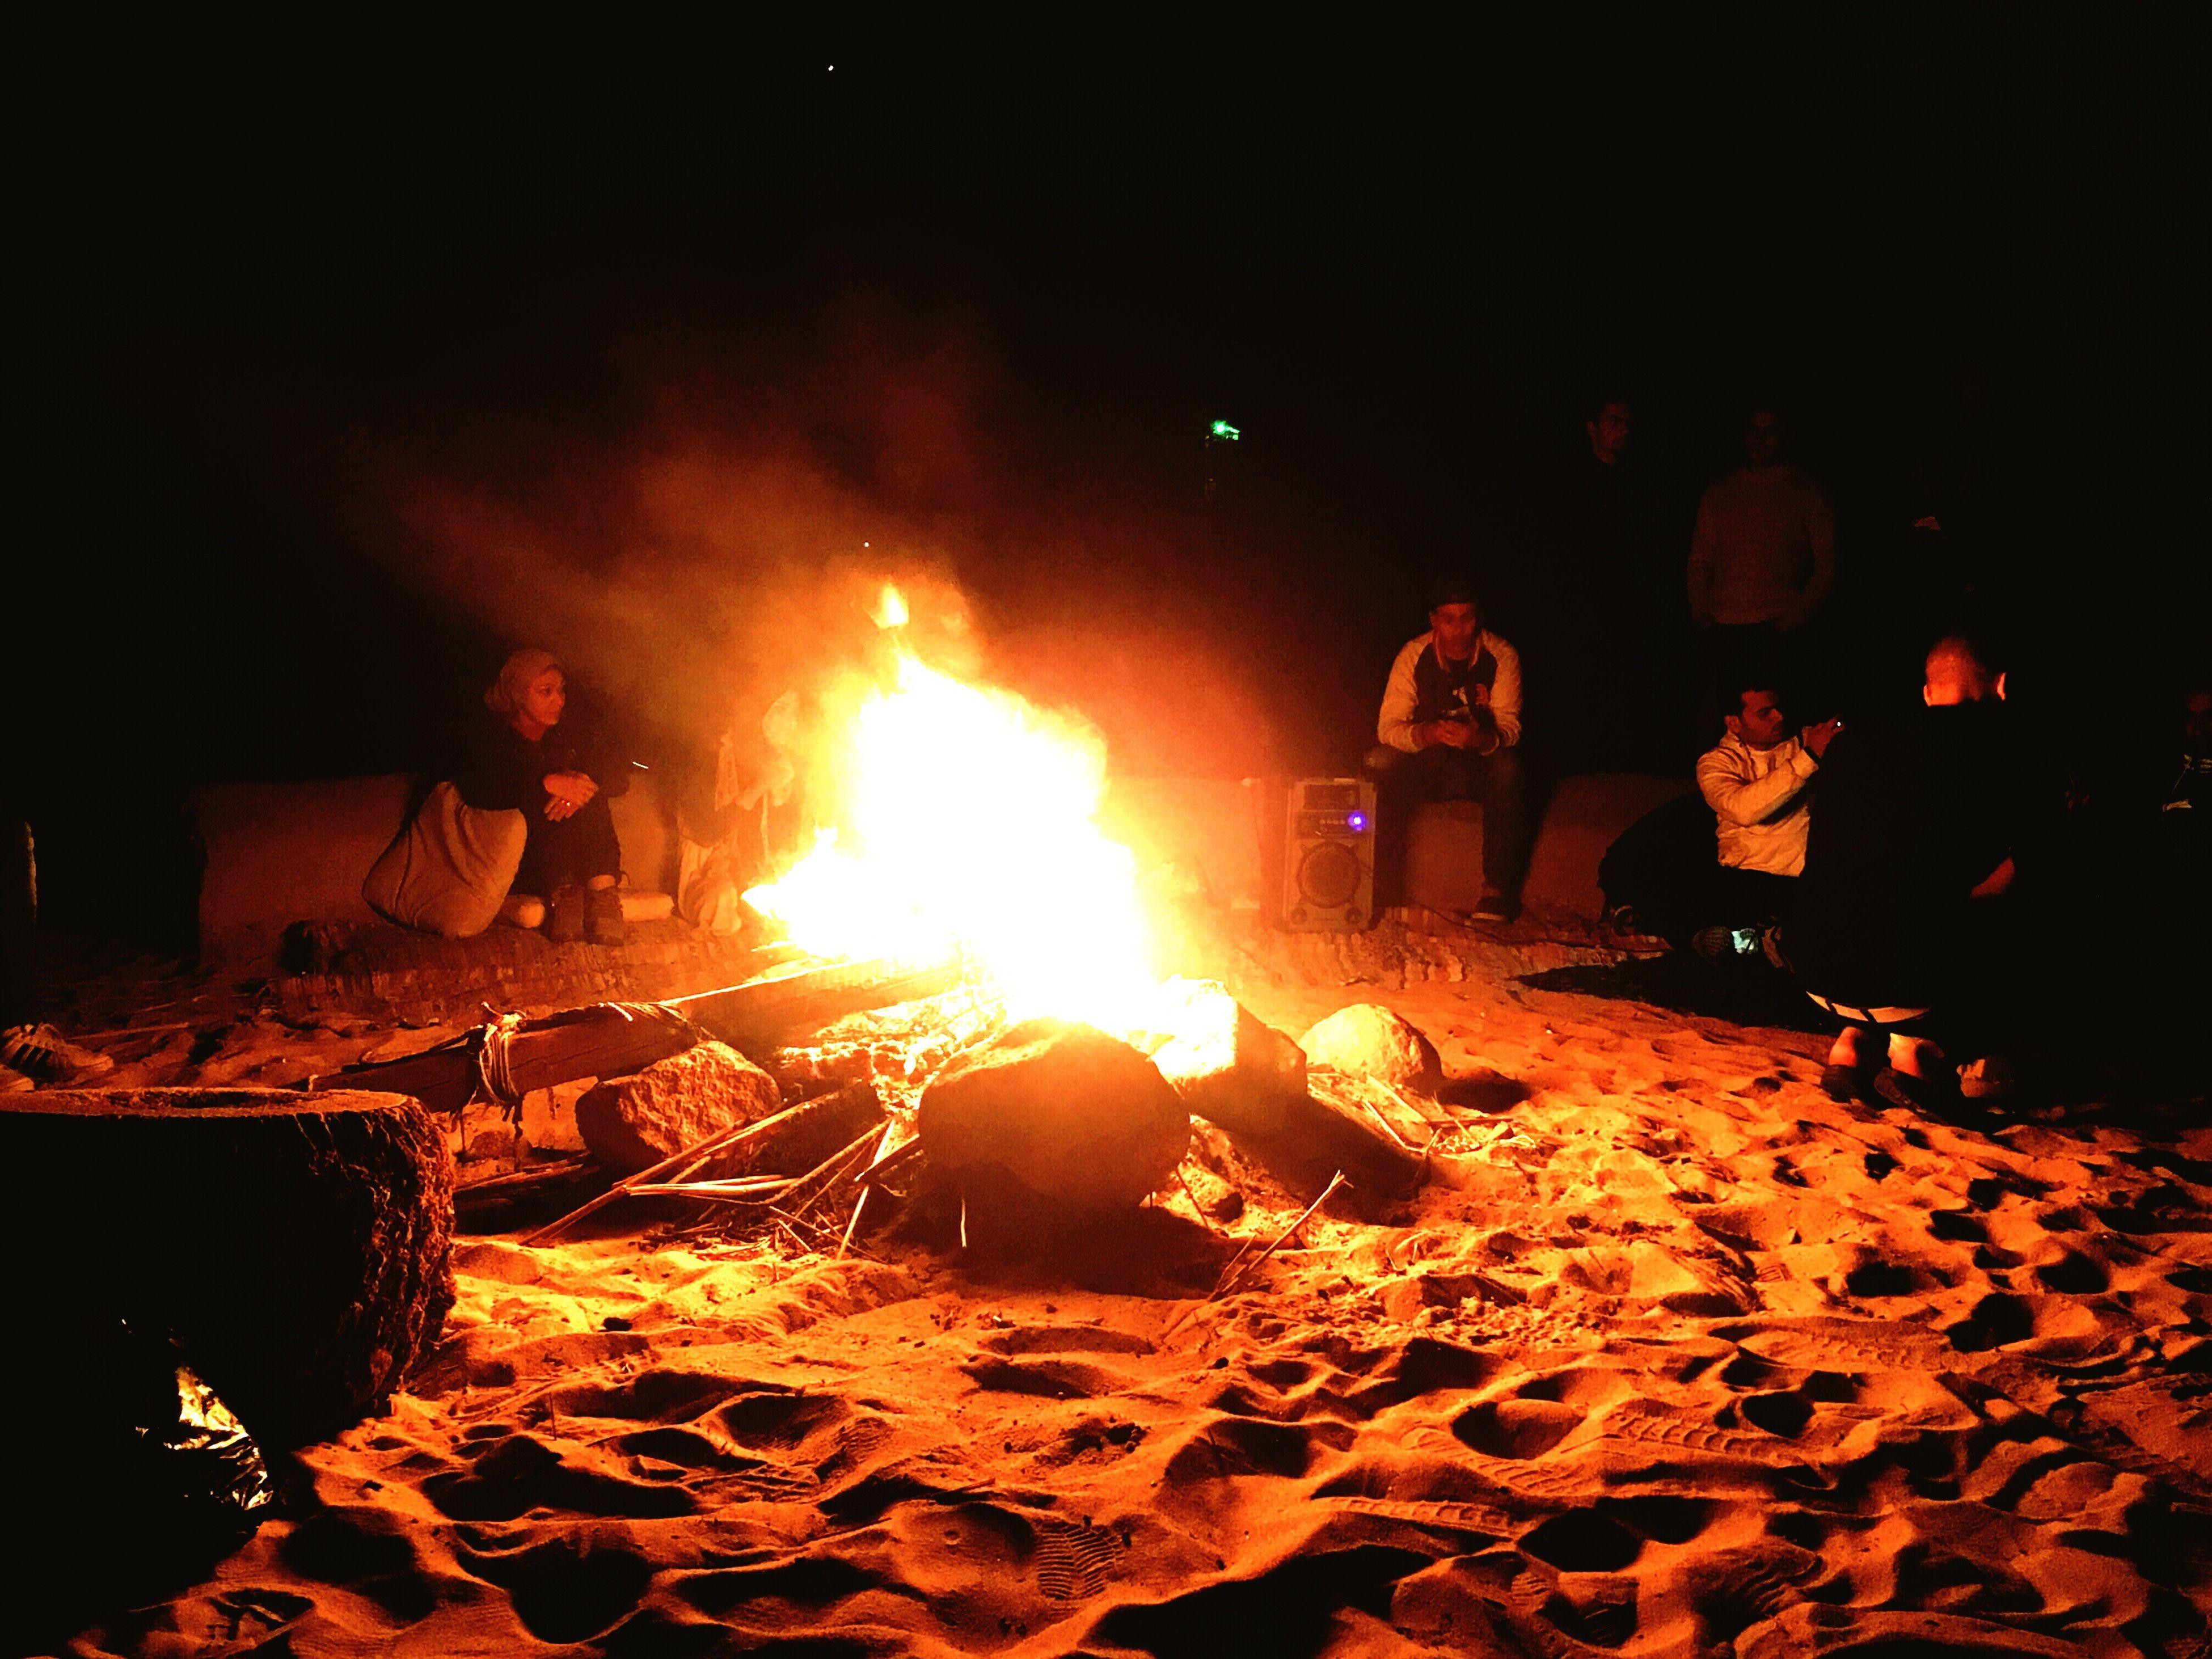 heat - temperature, burning, flame, night, real people, bonfire, men, outdoors, metal industry, people